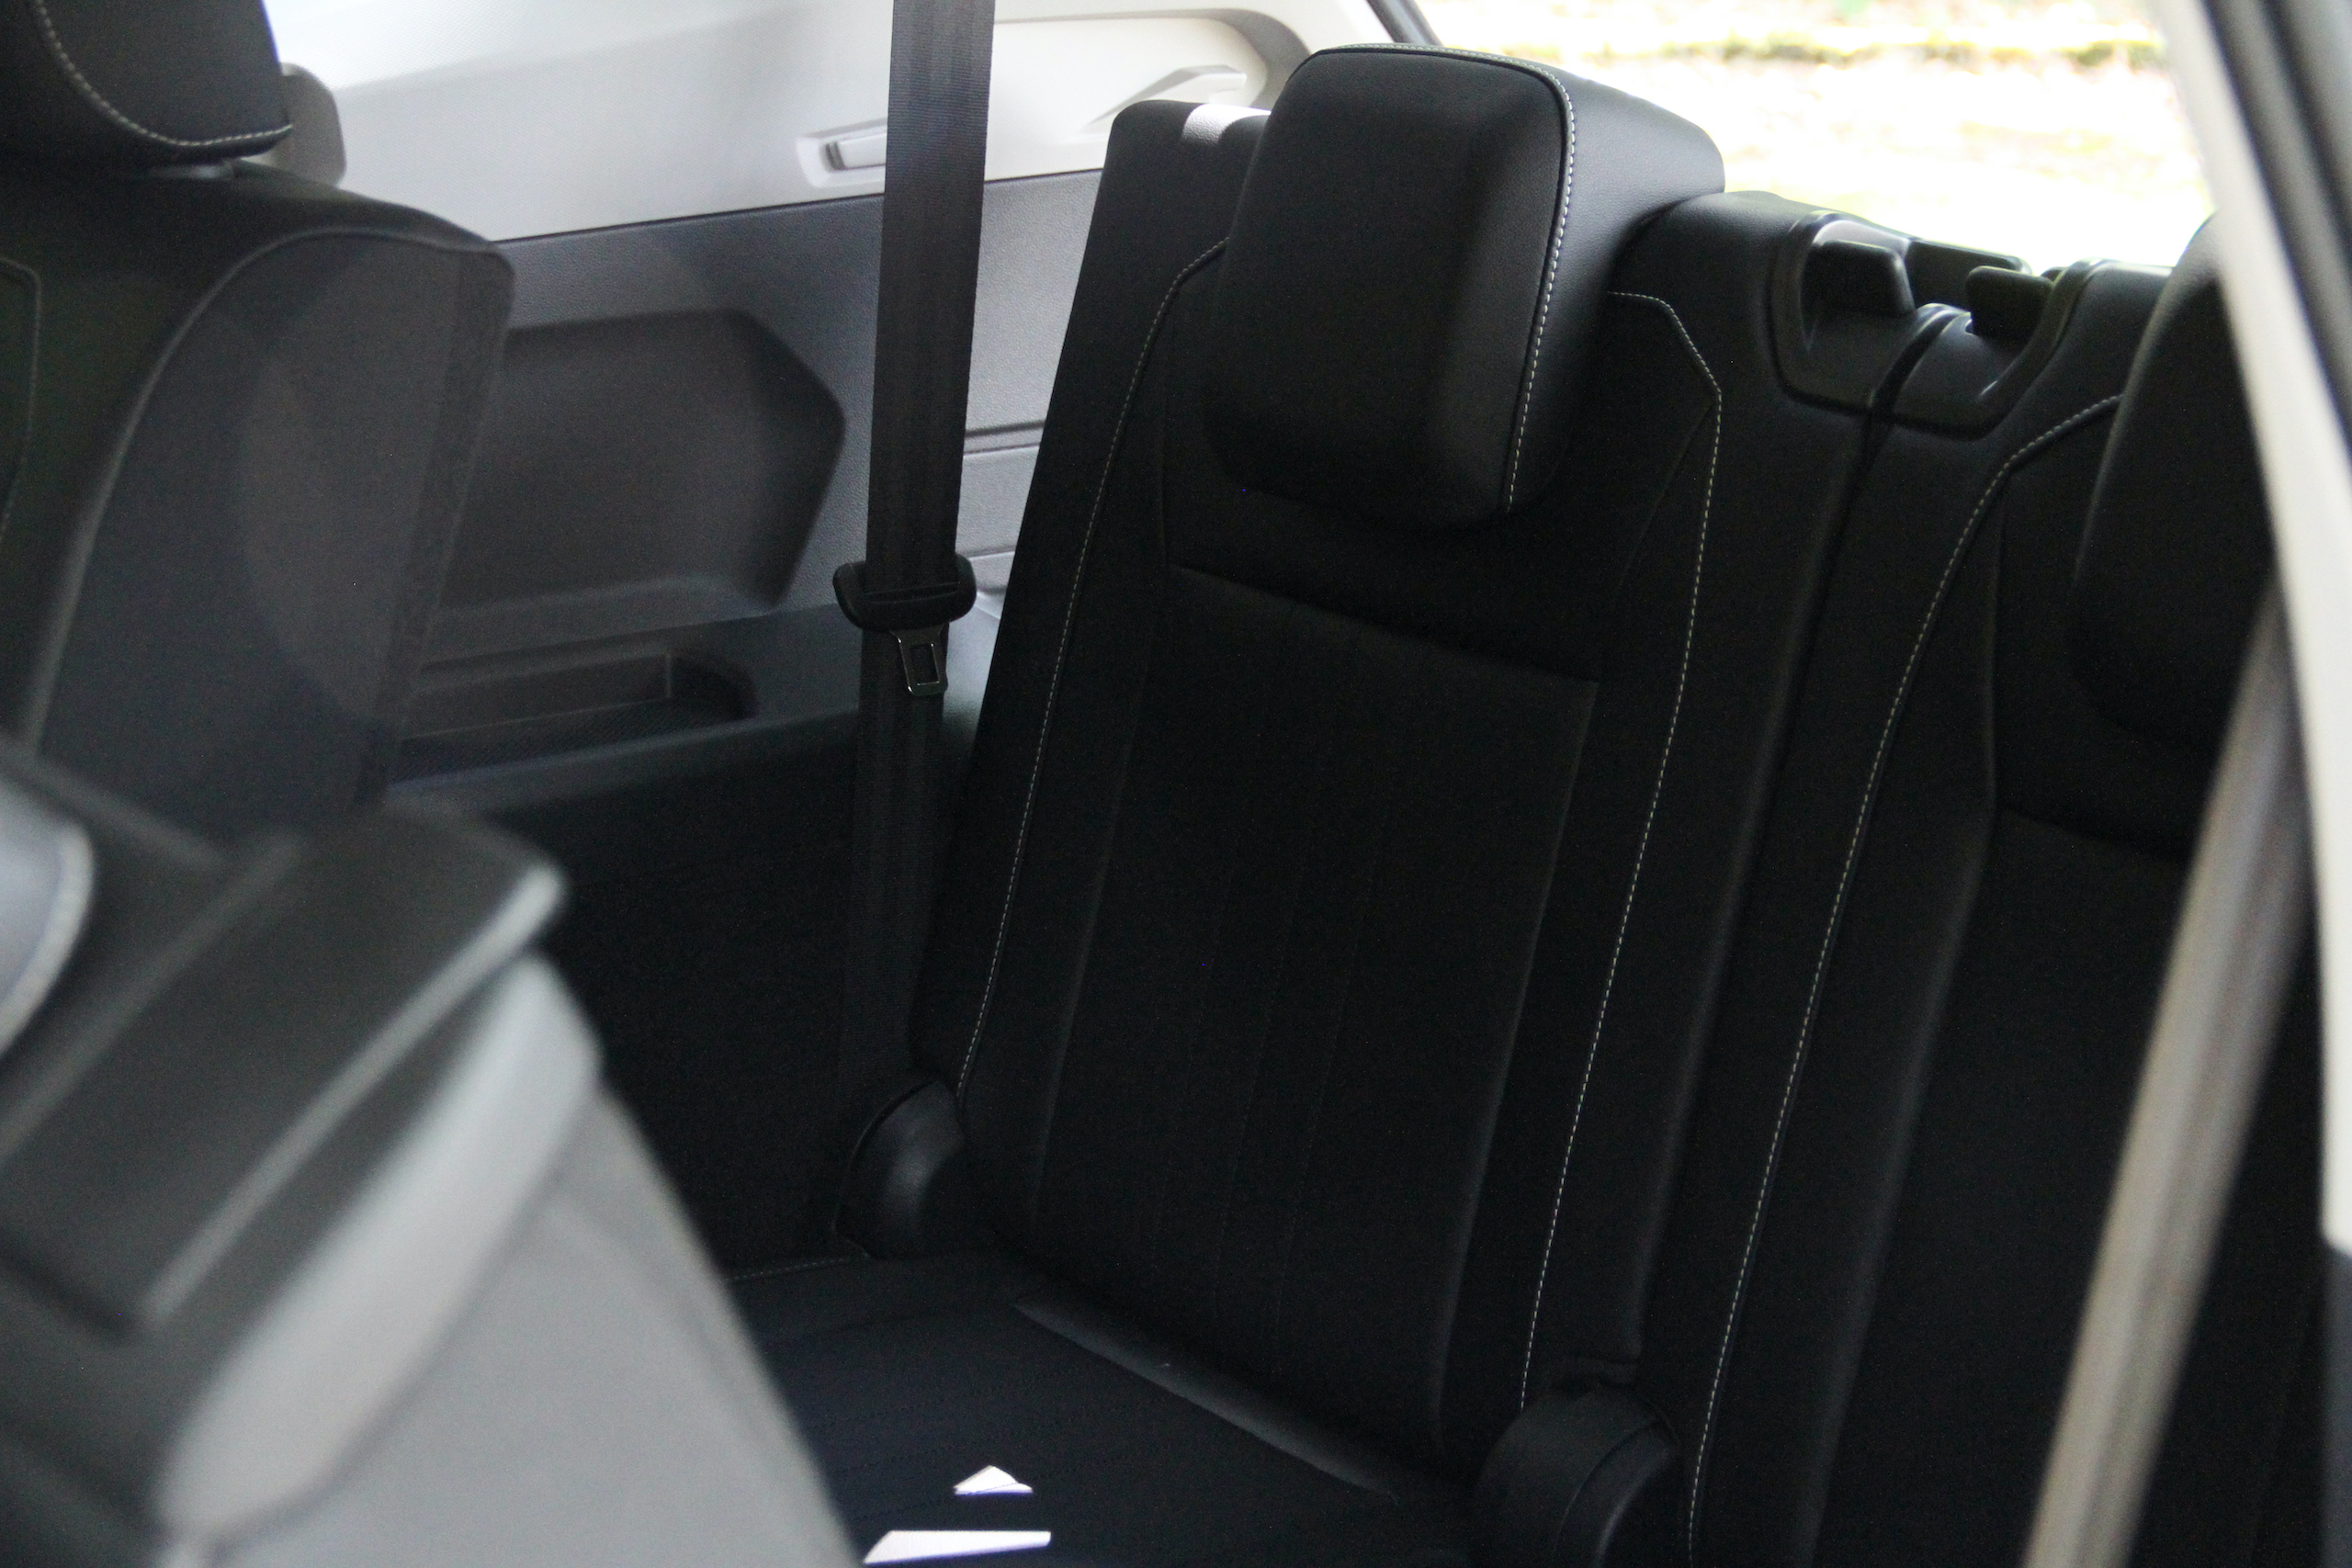 2022 VW Tiguan SE rear third row seat